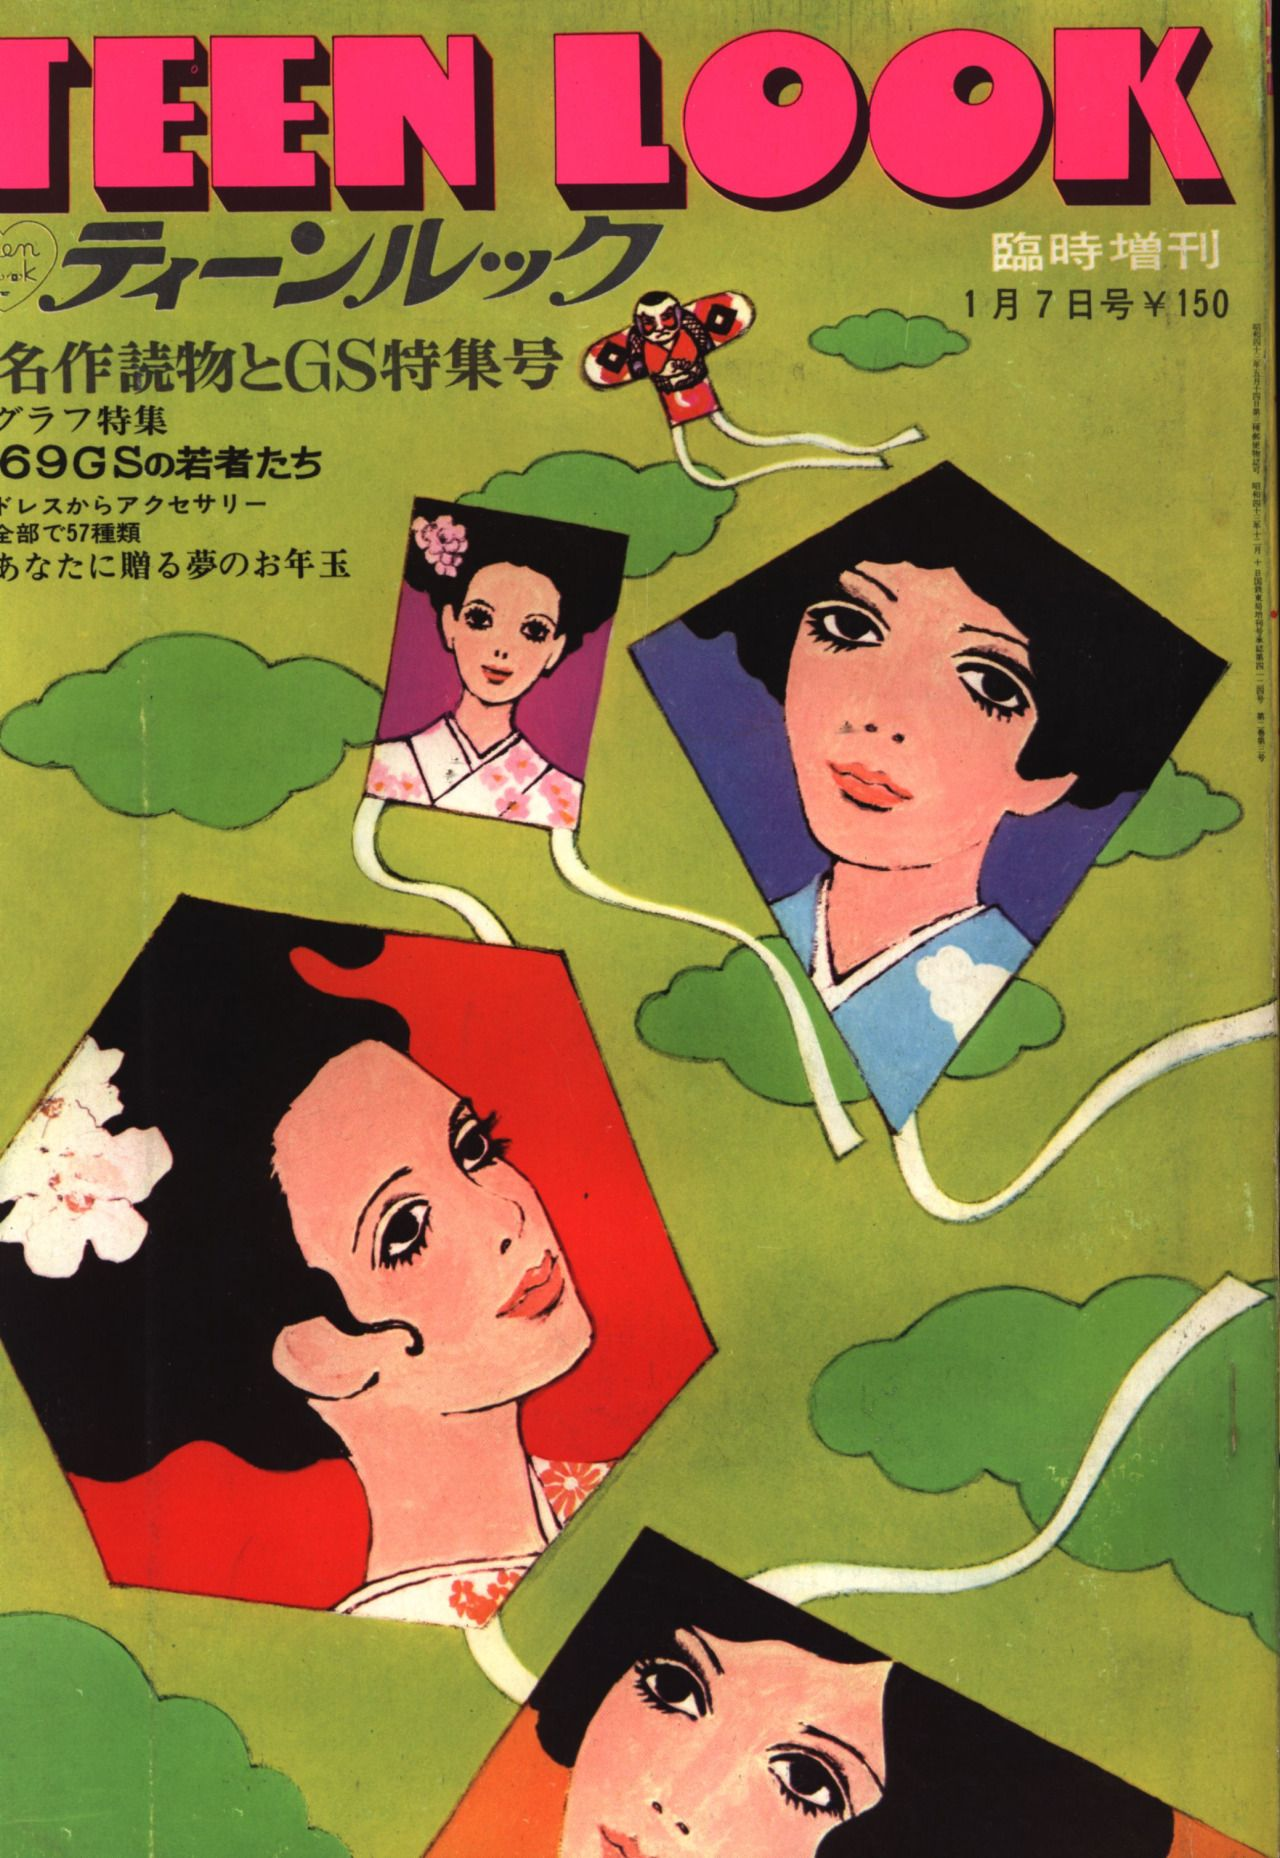 Teen japan covers